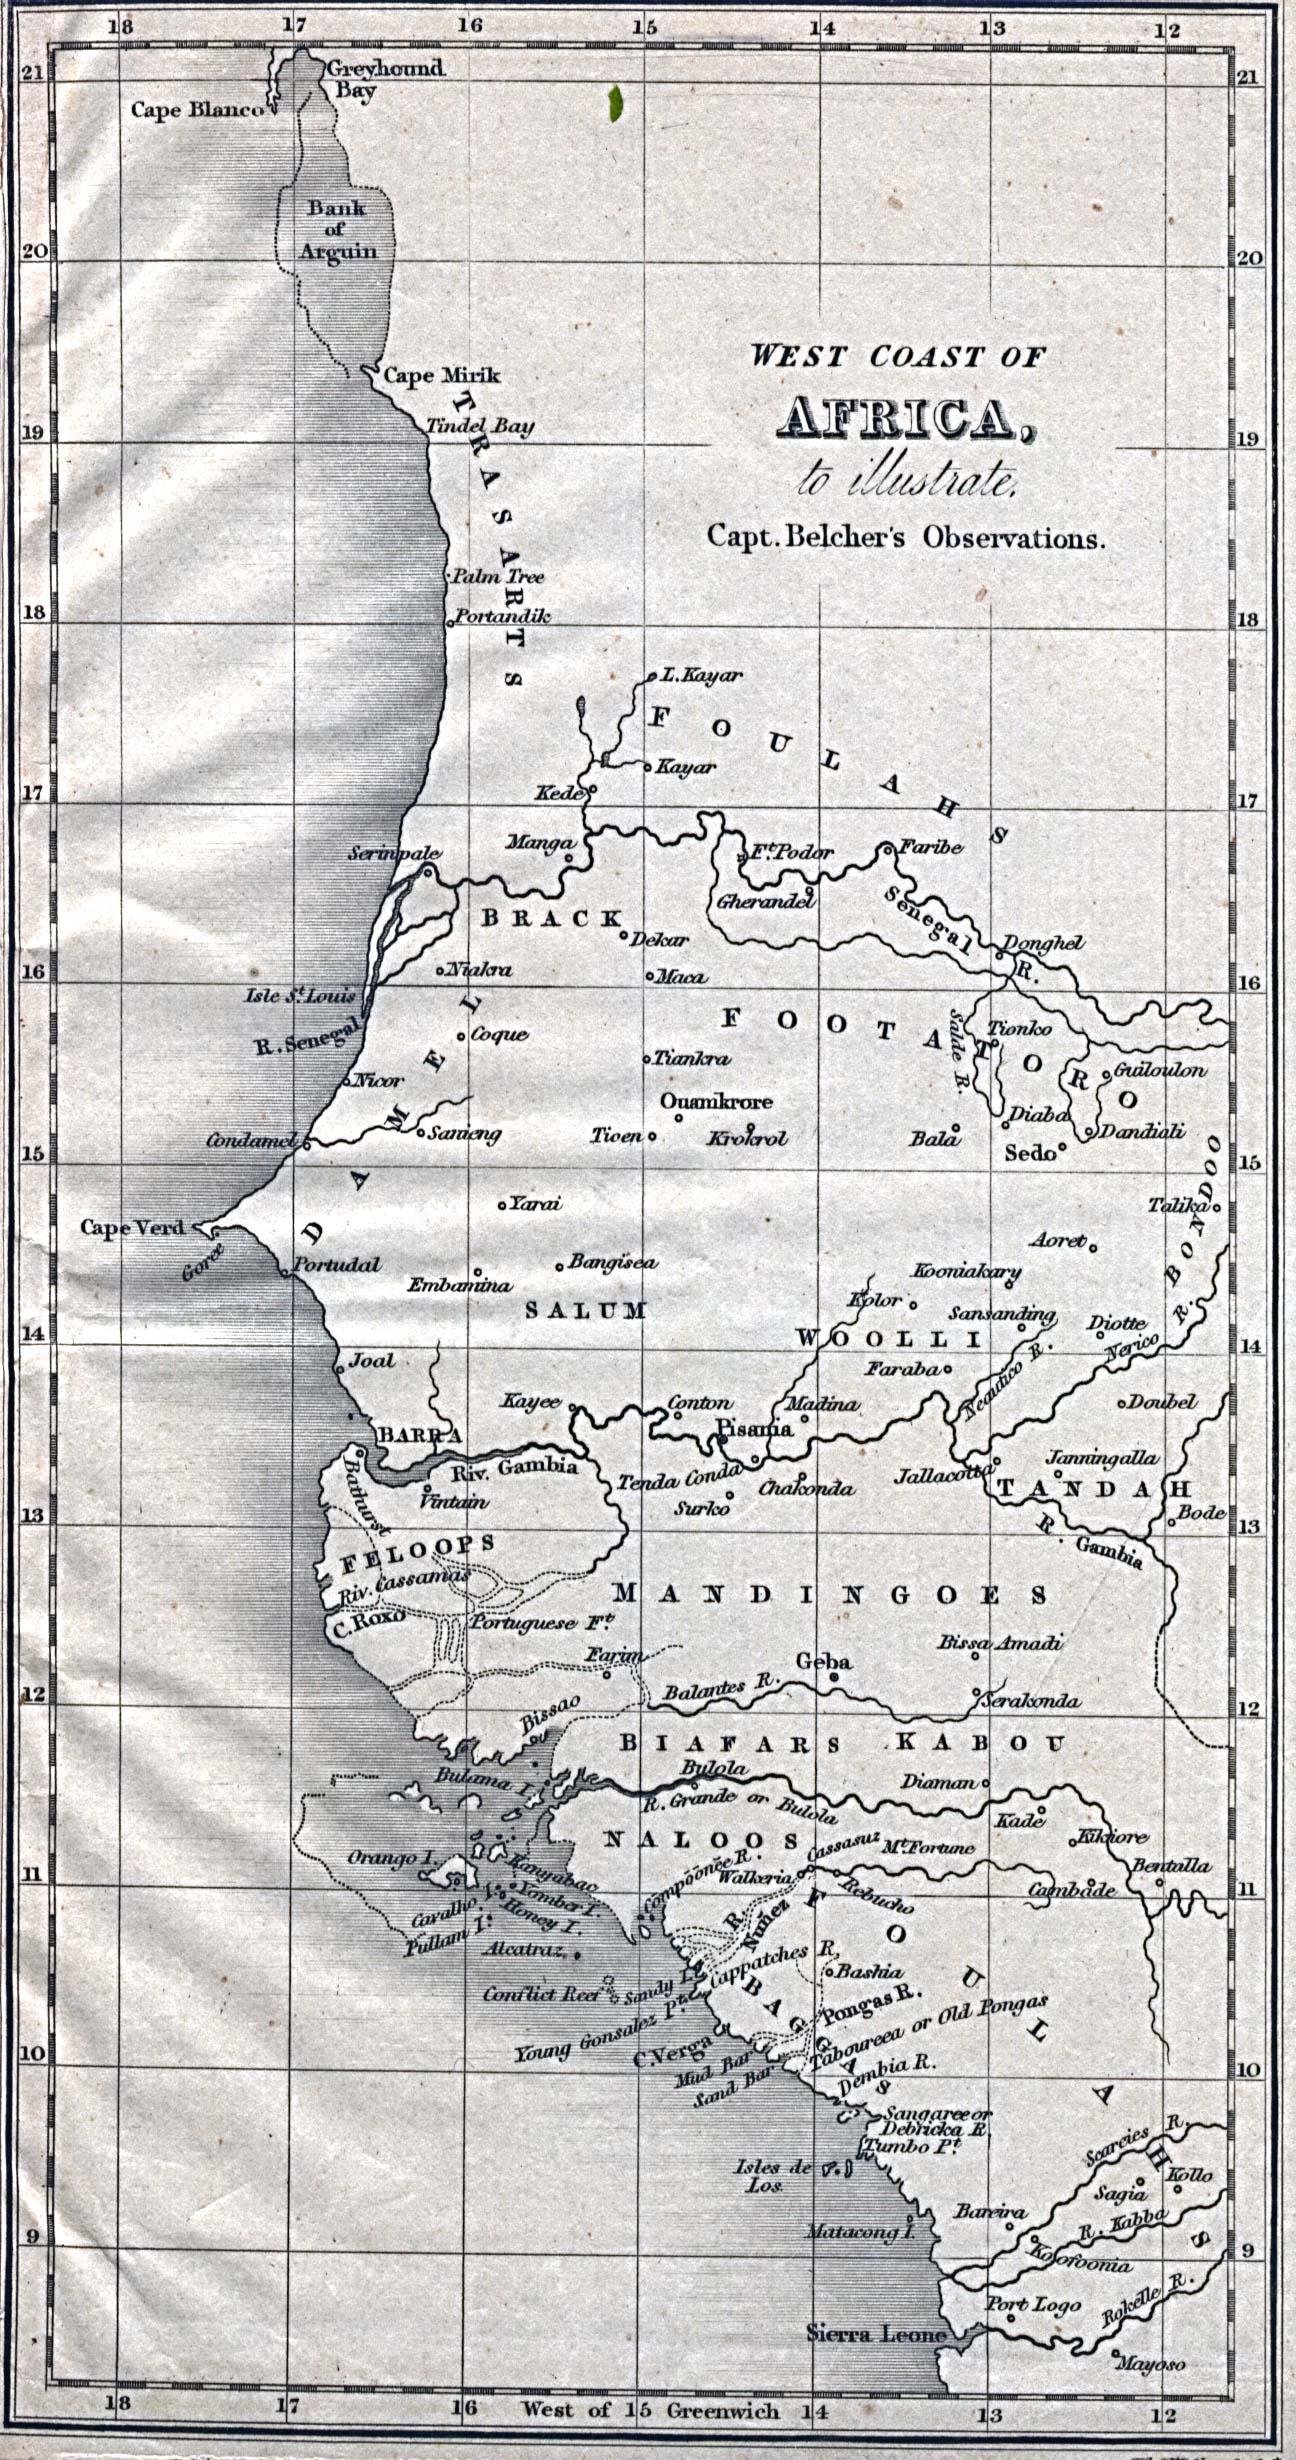 Africa West Coast Map 1832